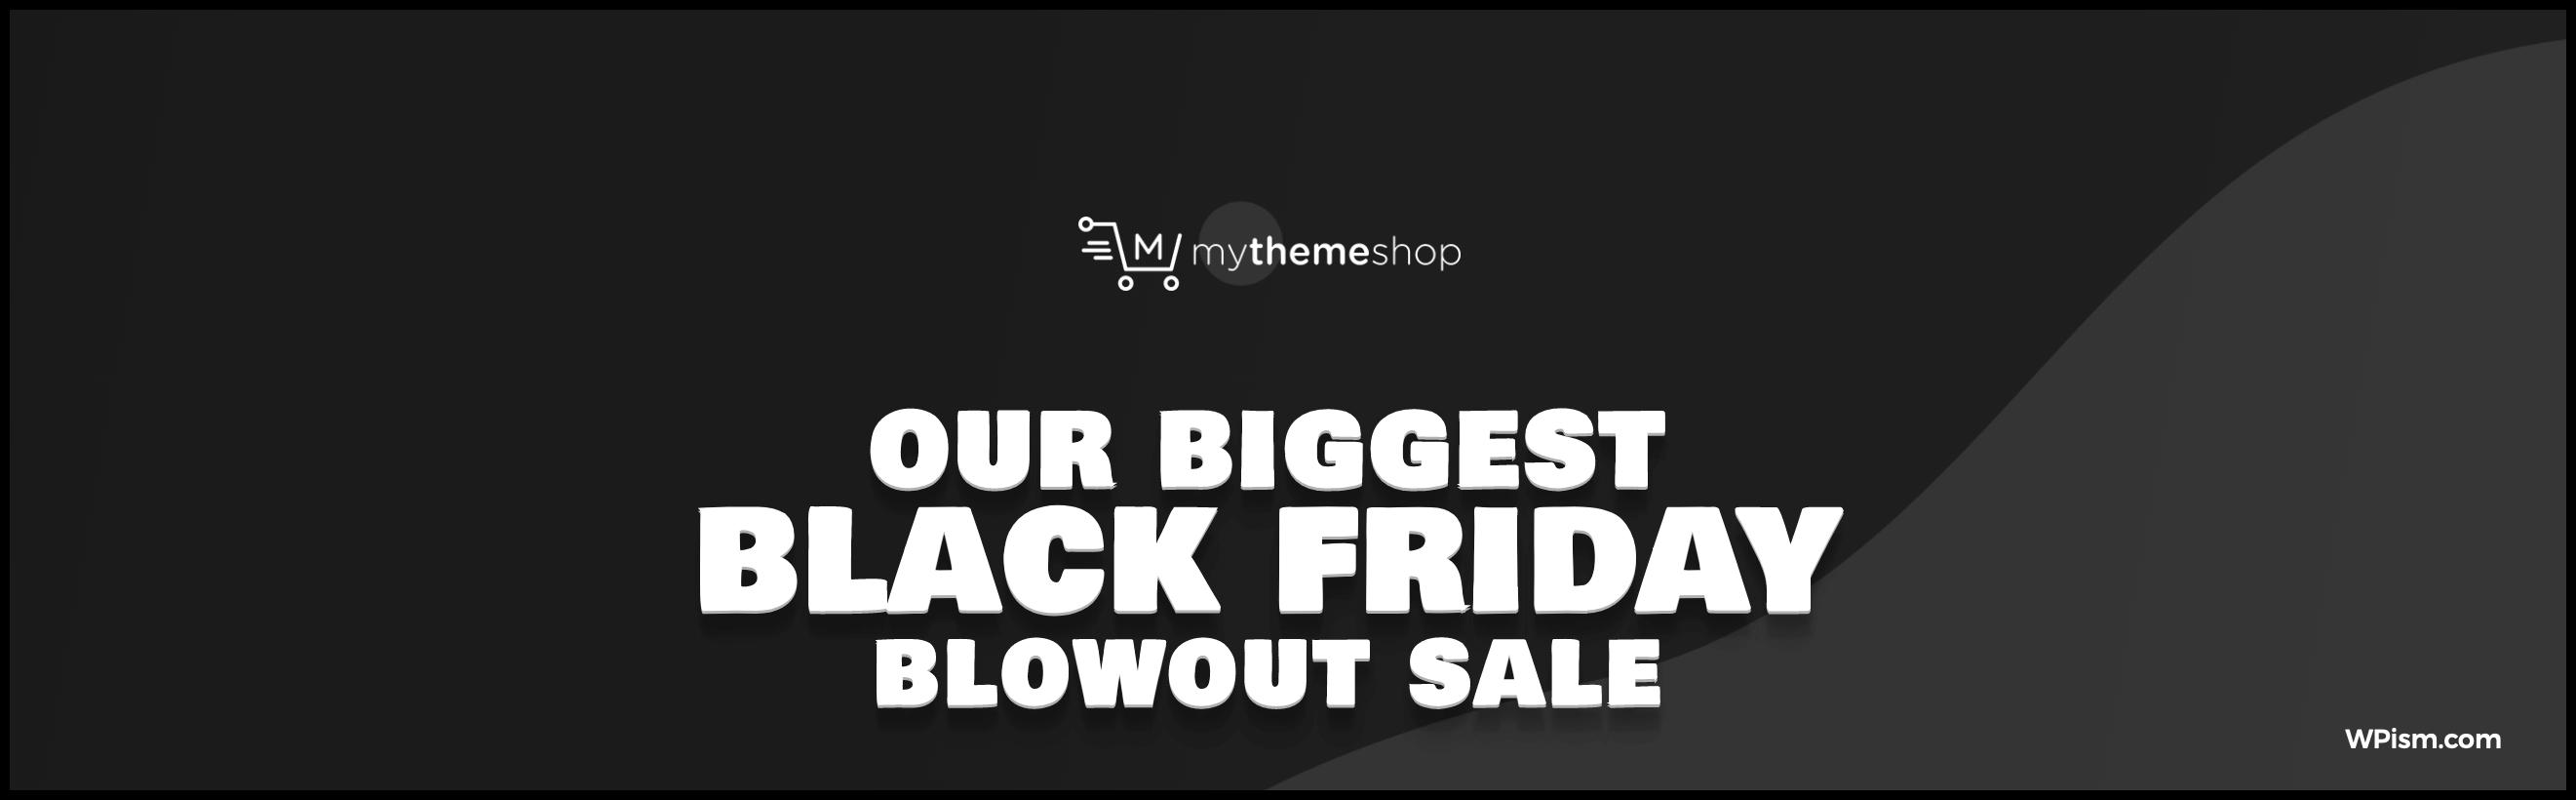 MyThemeShop Black Friday Deal 2018